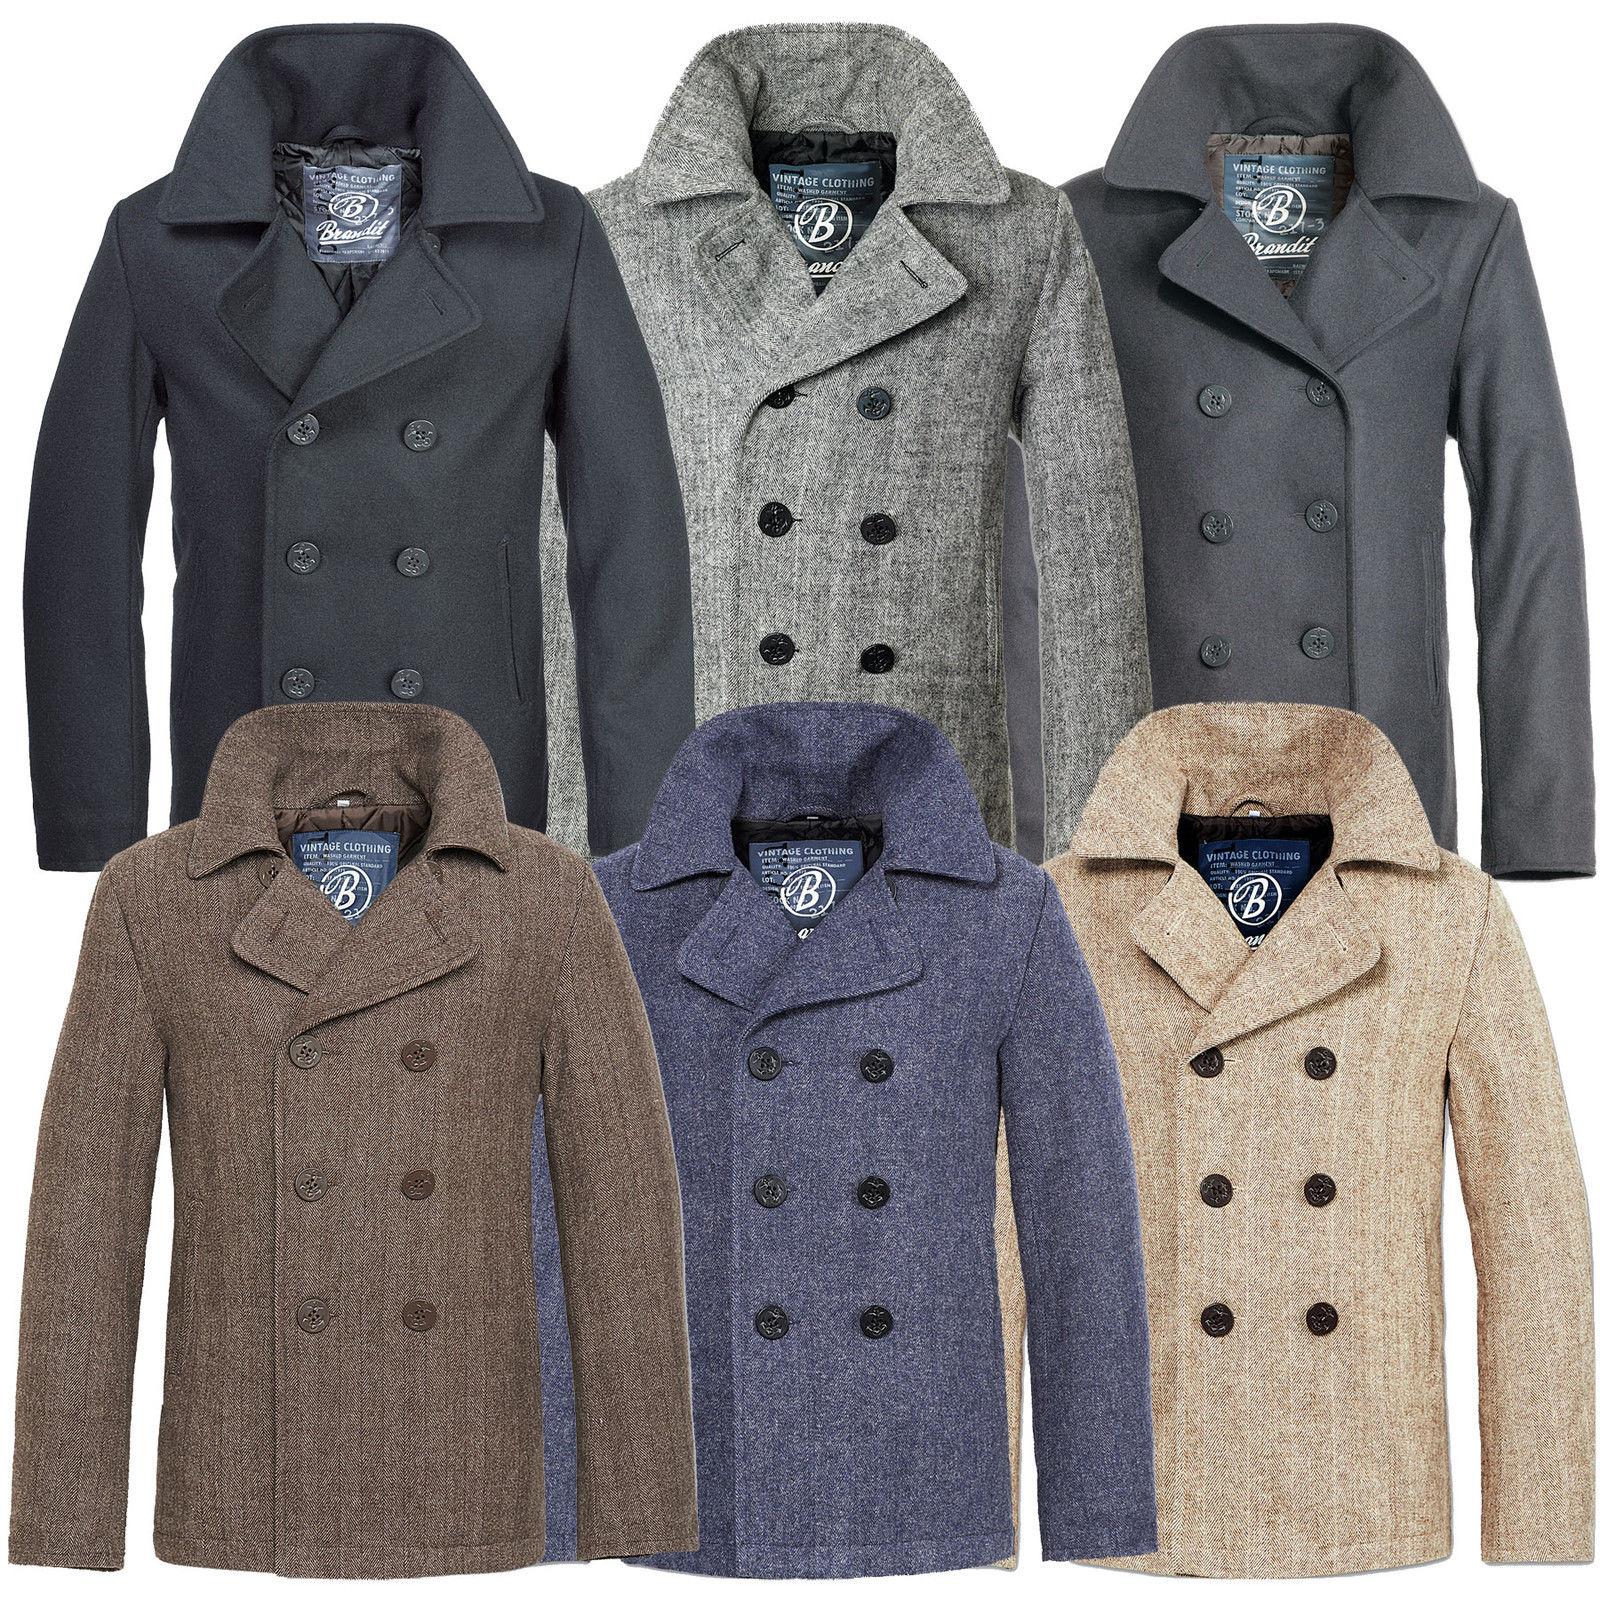 Woll Navy Brandit Zu Coat Caban Pea Details Kurzmantel Jacke Winter Marine Mantel Herren WQrdCexBo